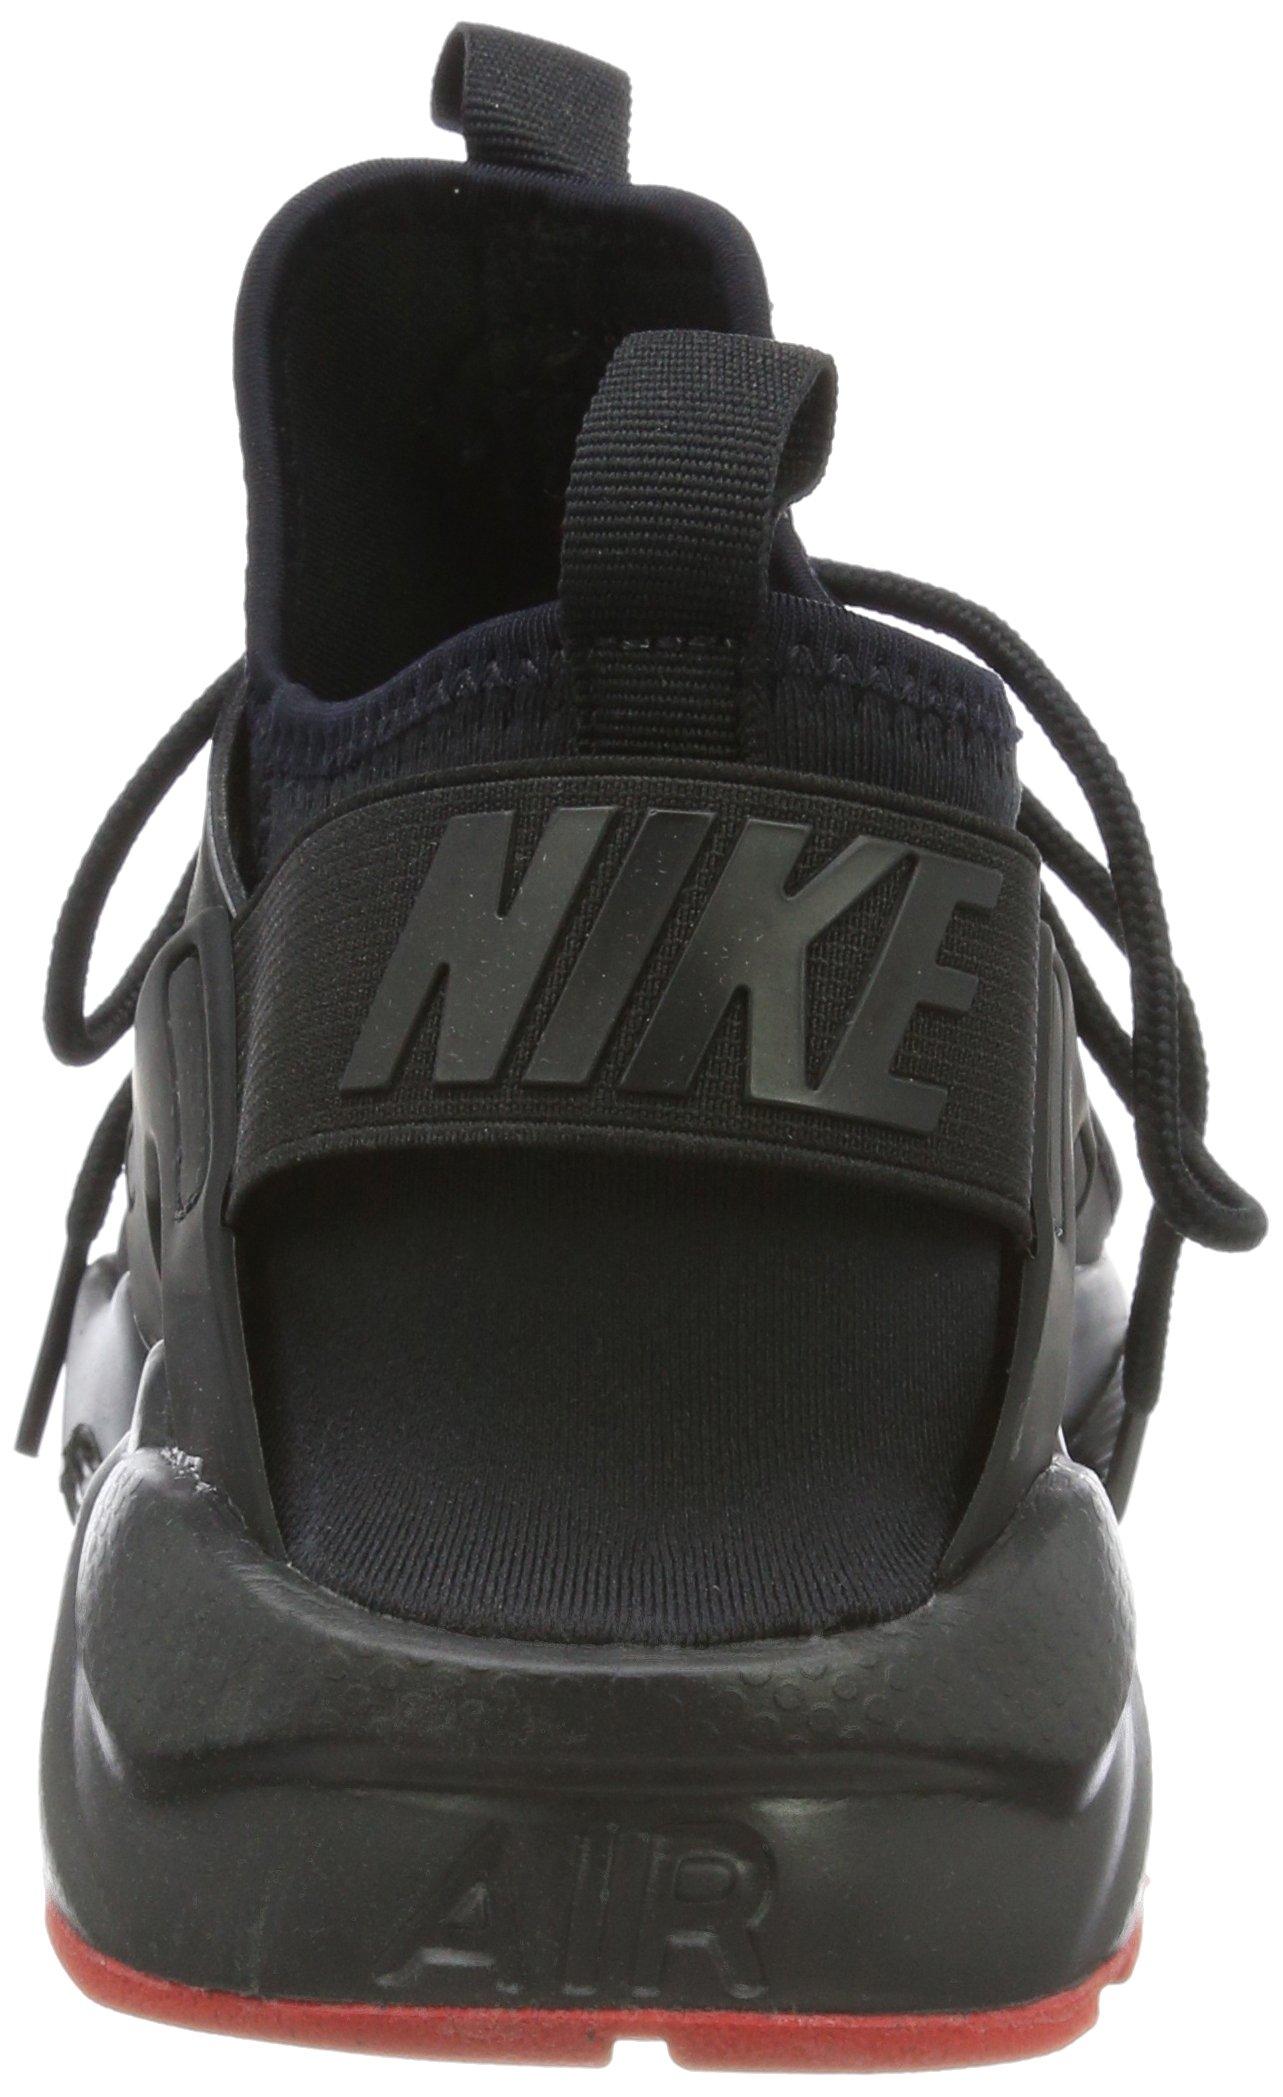 Nike Air Huarache Run Ultra Black/Metallic Silver (11 D(M) US) by NIKE (Image #2)